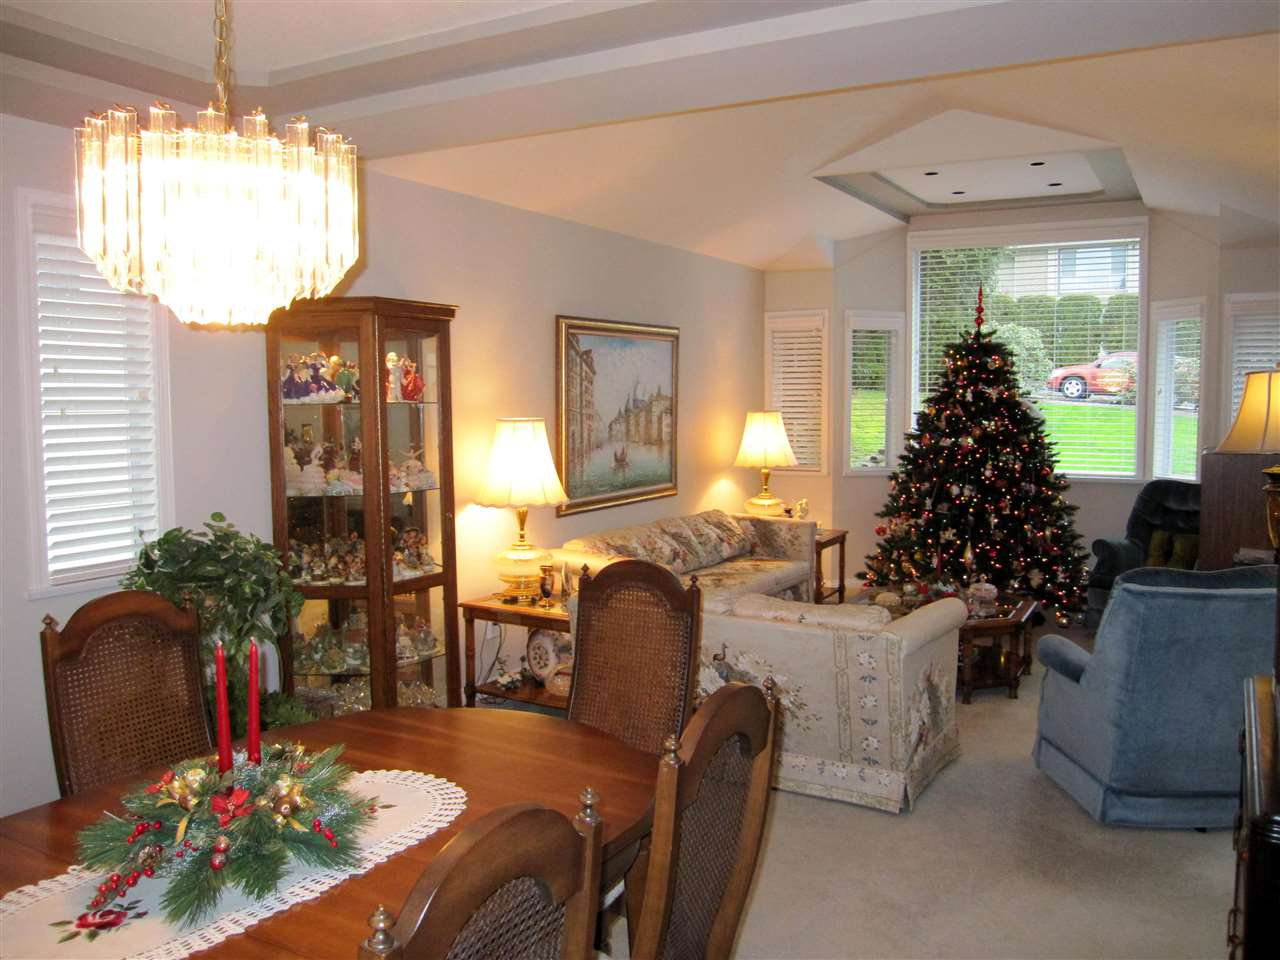 Photo 3: Photos: 23647 TAMARACK Lane in Maple Ridge: Albion House for sale : MLS®# R2019626